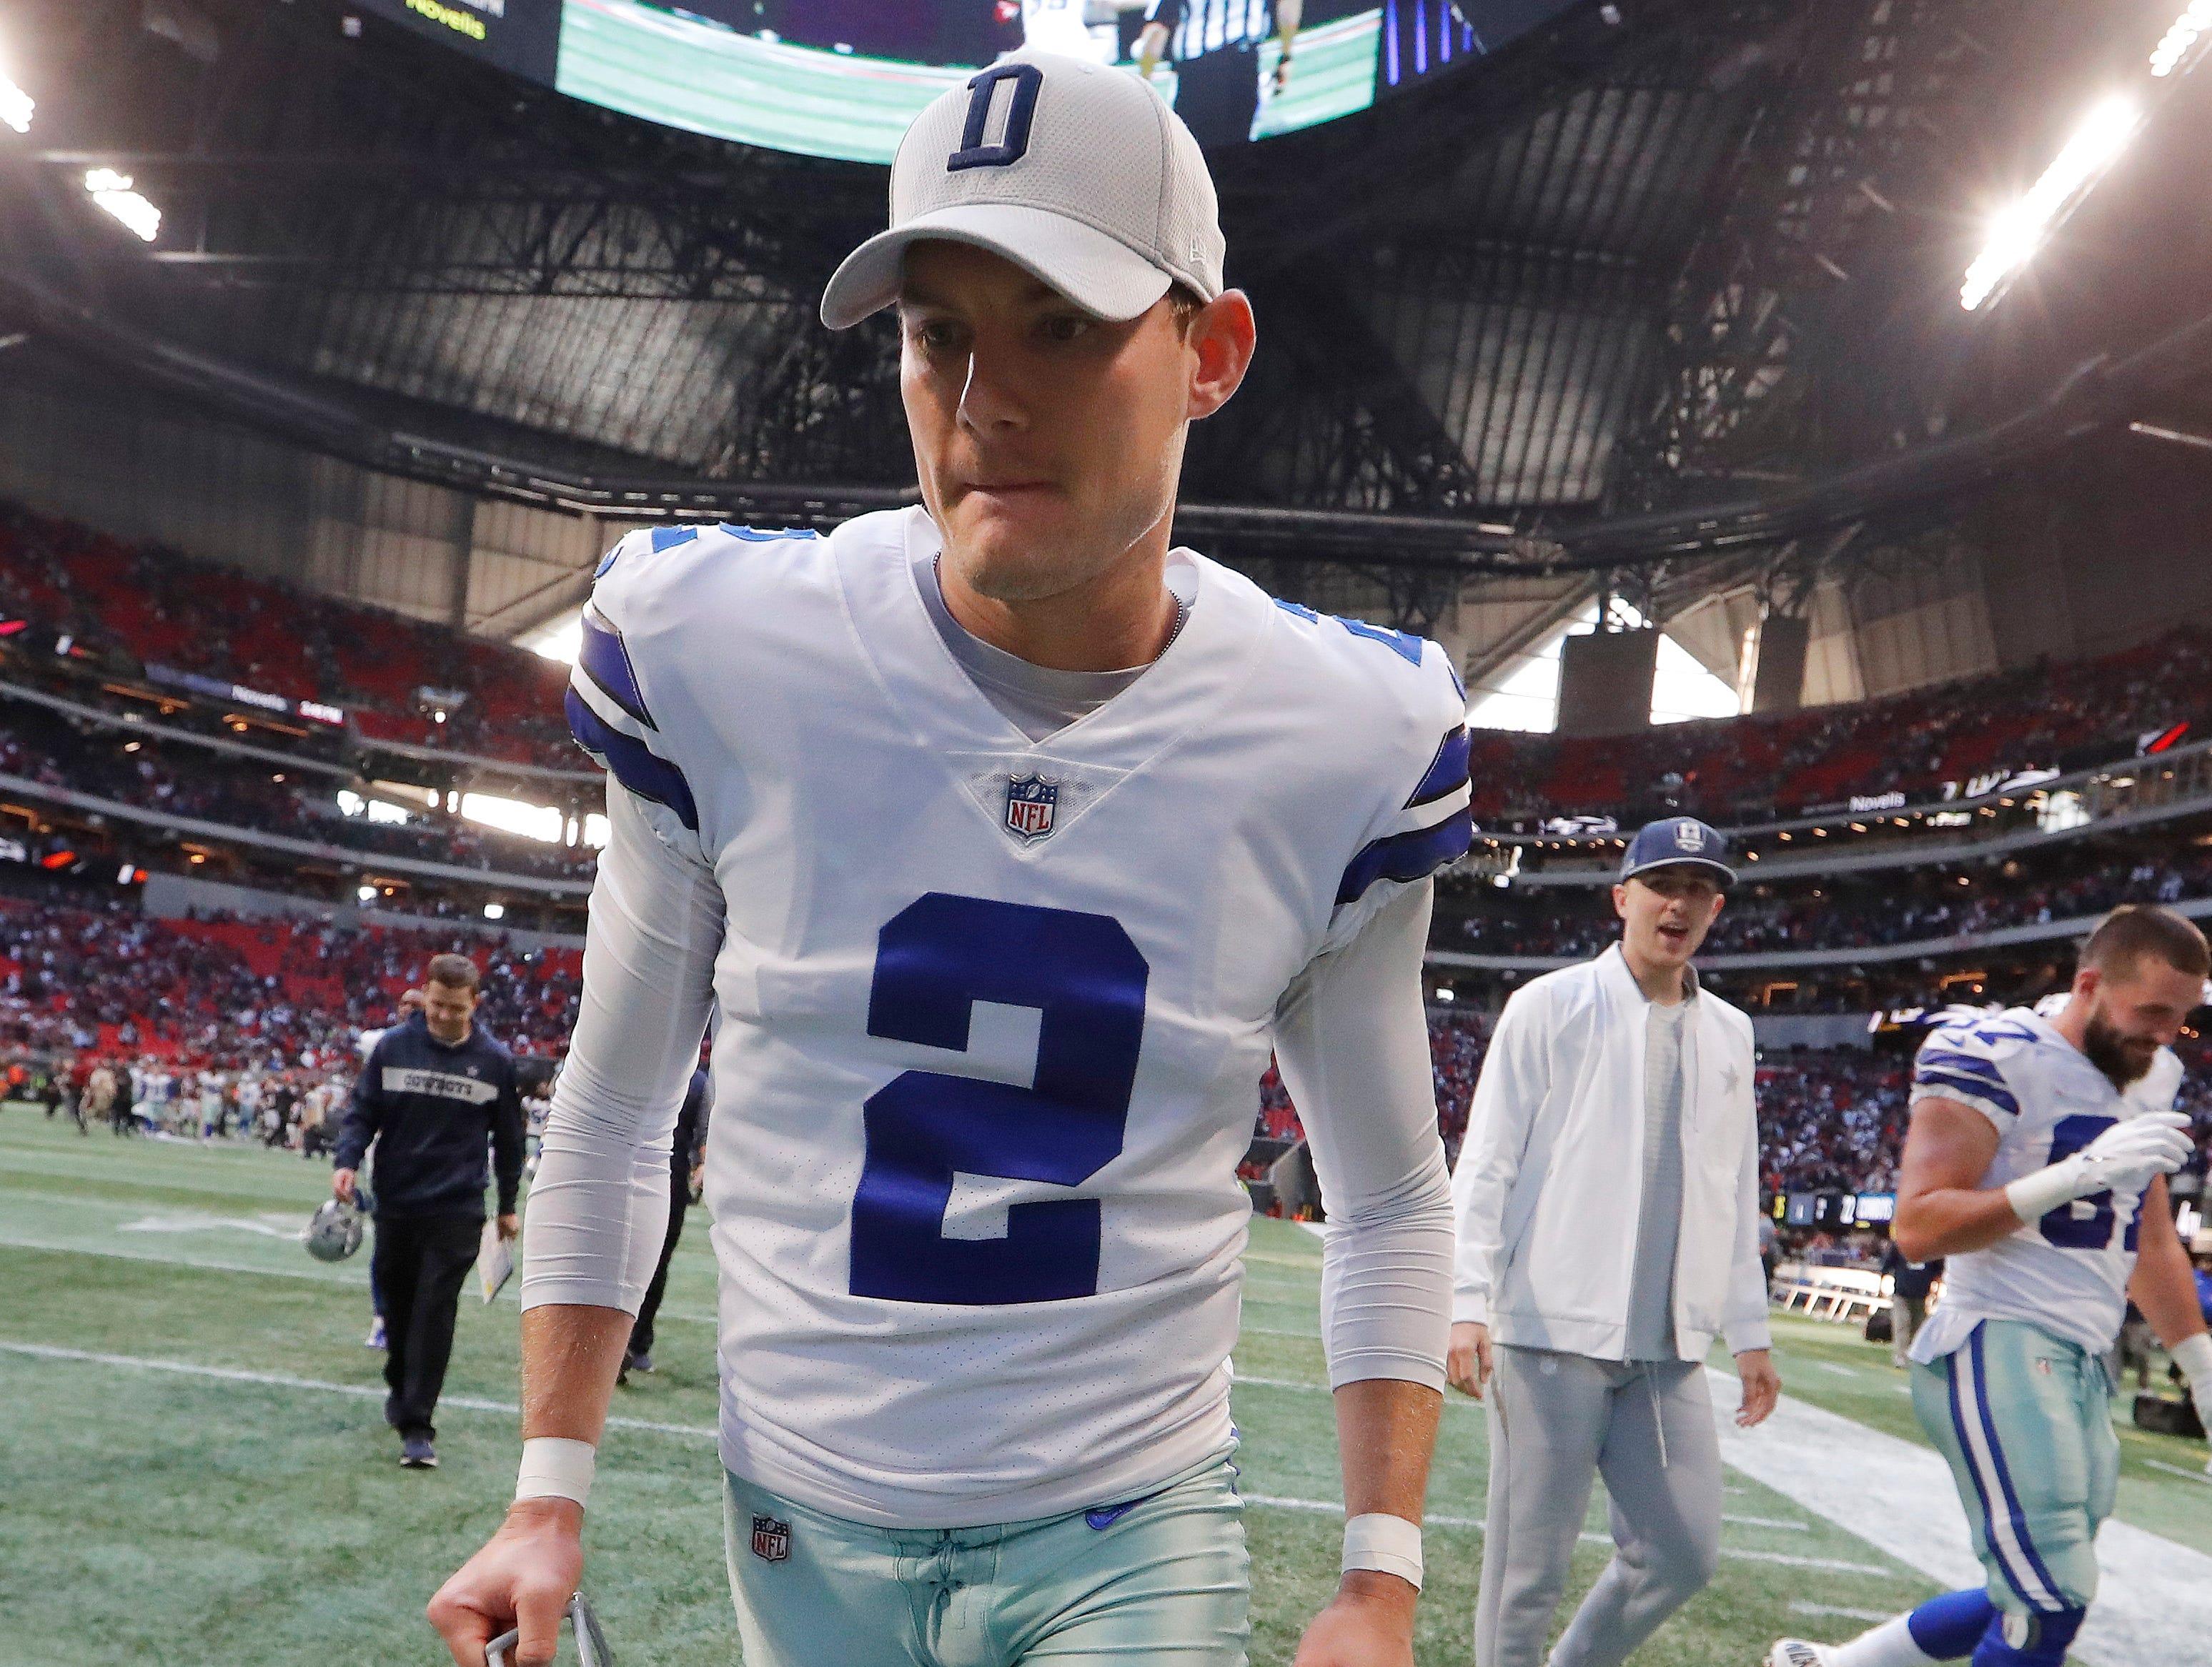 Dallas Cowboys kicker Brett Maher (2) leaves the field after an NFL football game against the Atlanta Falcons, Sunday, Nov. 18, 2018, in Atlanta. The Dallas Cowboys won 22-19. (AP Photo/John Bazemore)